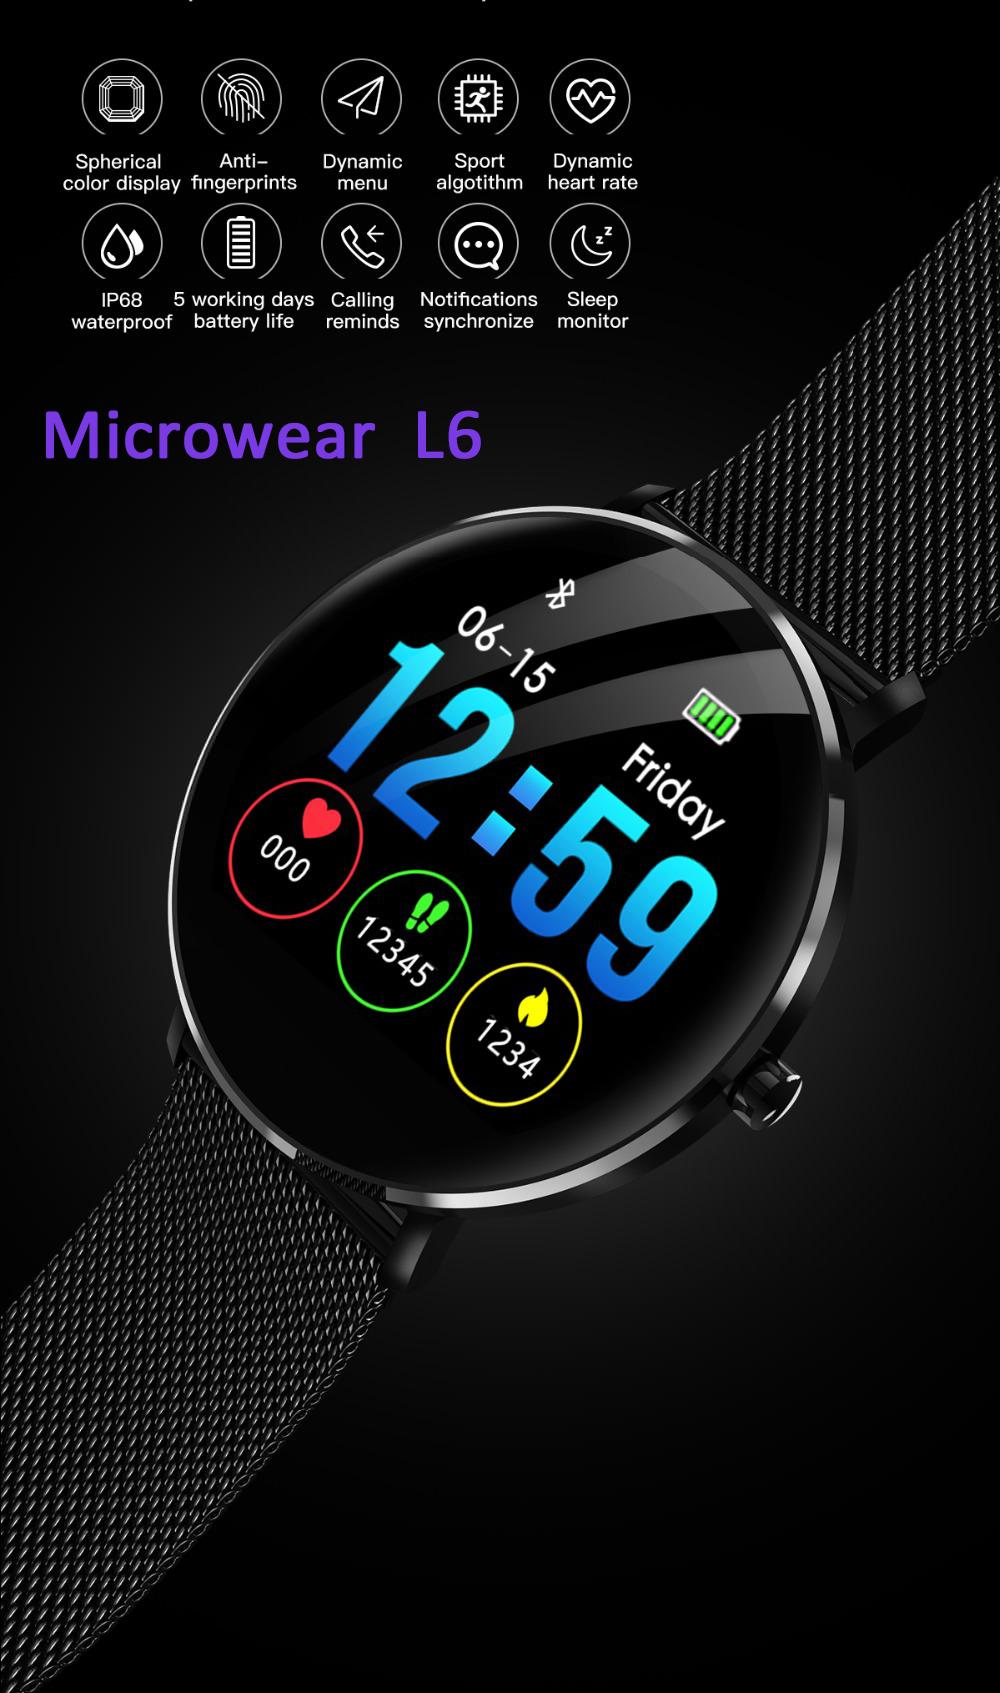 microwear l6 smartwatch